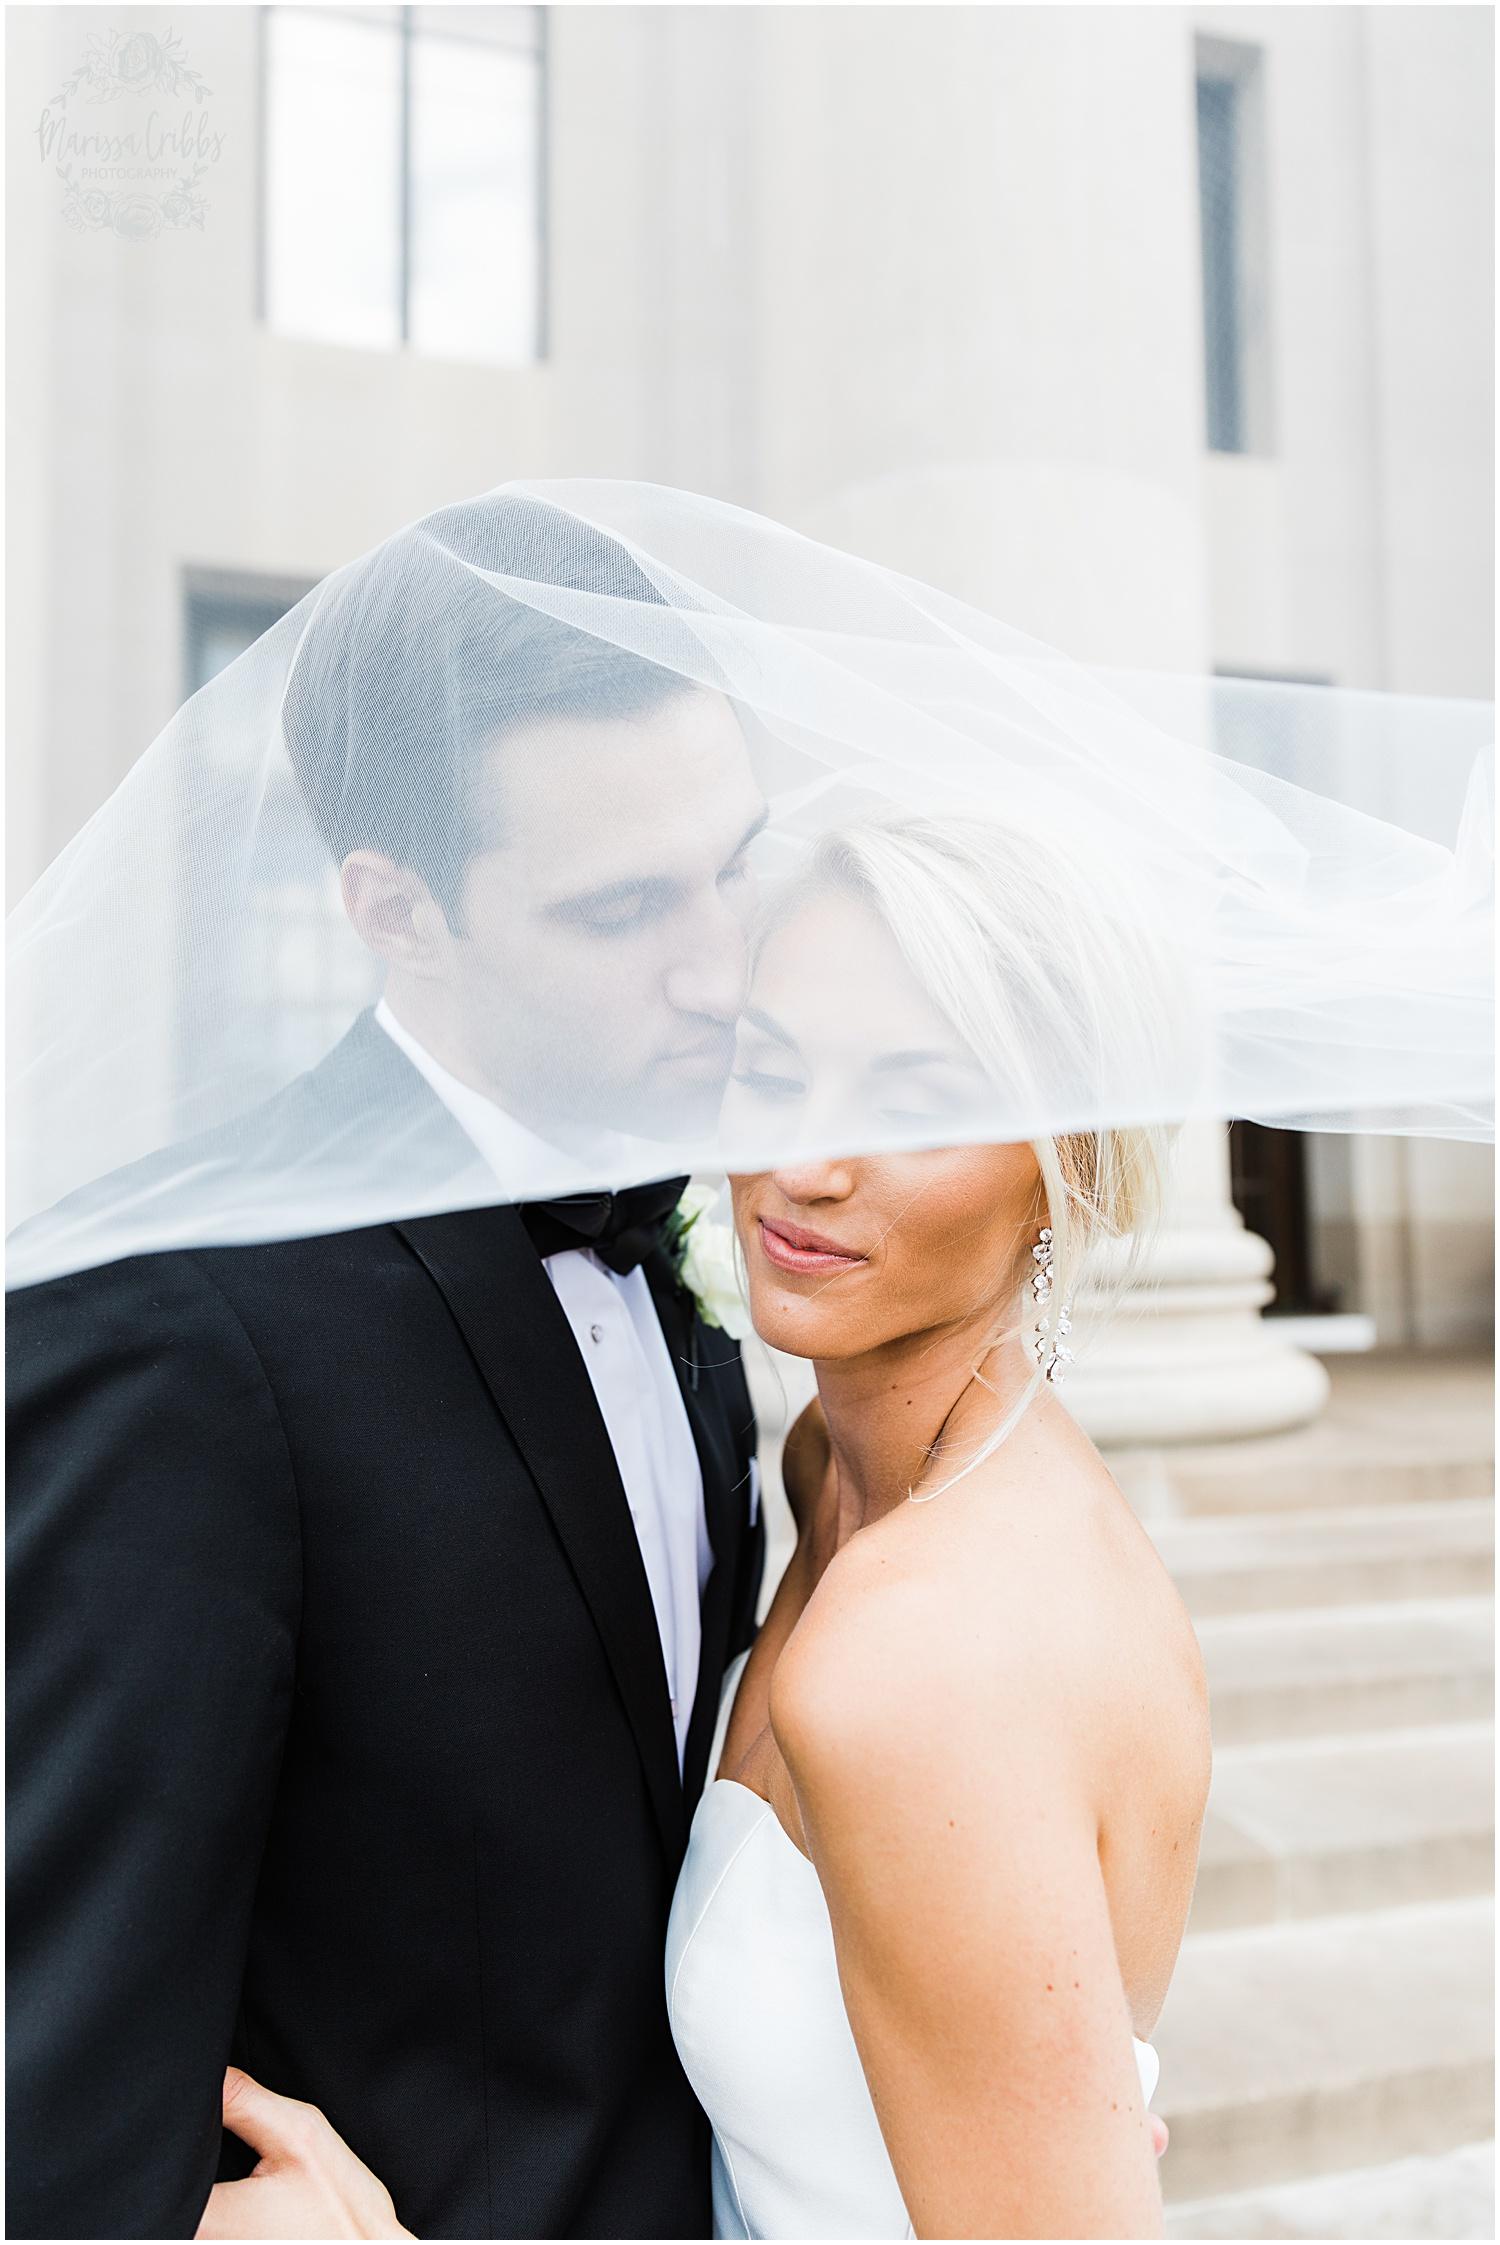 NOLL WEDDING | THE BRASS ON BALTIMORE | MARISSA CRIBBS PHOTOGRAPHY_6327.jpg